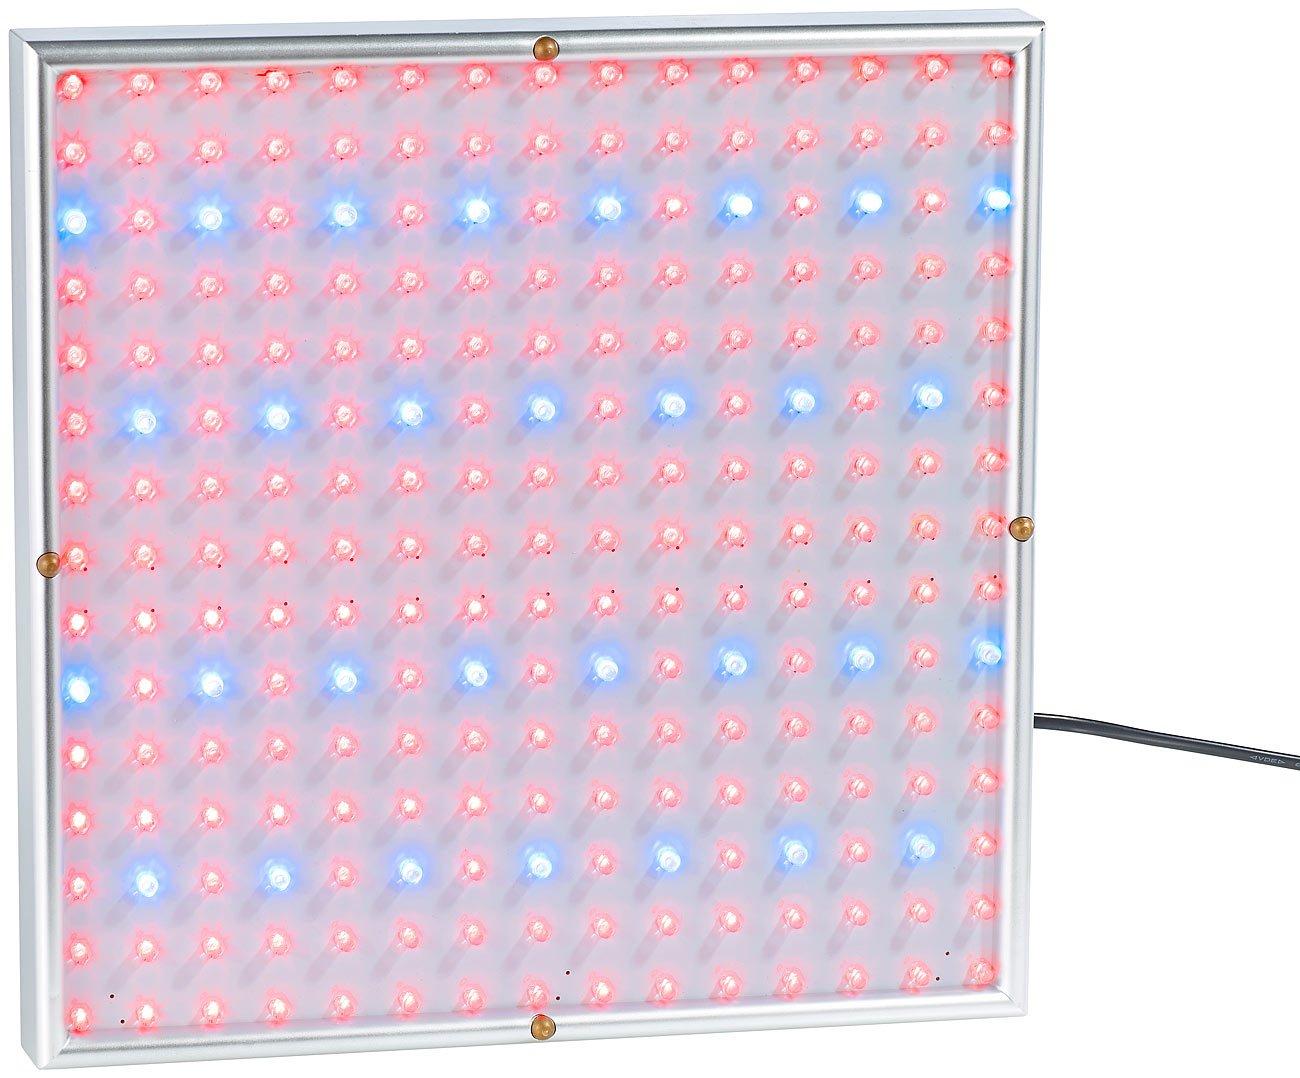 3er-Set 225 LEDs Lunartec Pflanzenlampe: Profi LED-Pflanzen-Wachstums-leuchtpanels LED Pflanzenleuchte